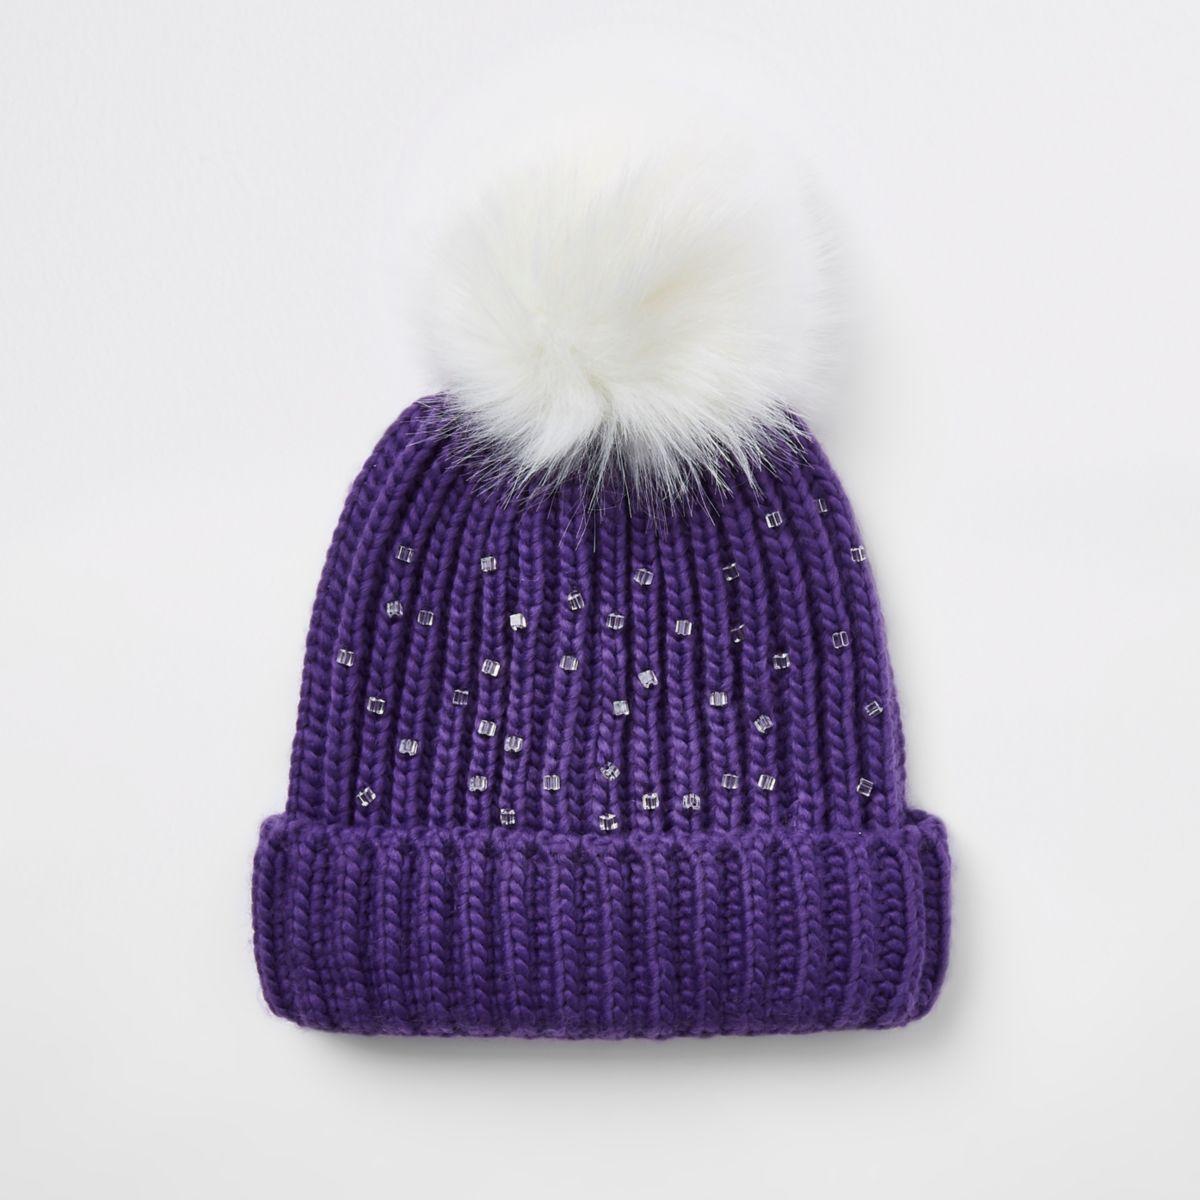 1cd1cb22902c Girls purple embellished beanie hat - Hats - Accessories - girls